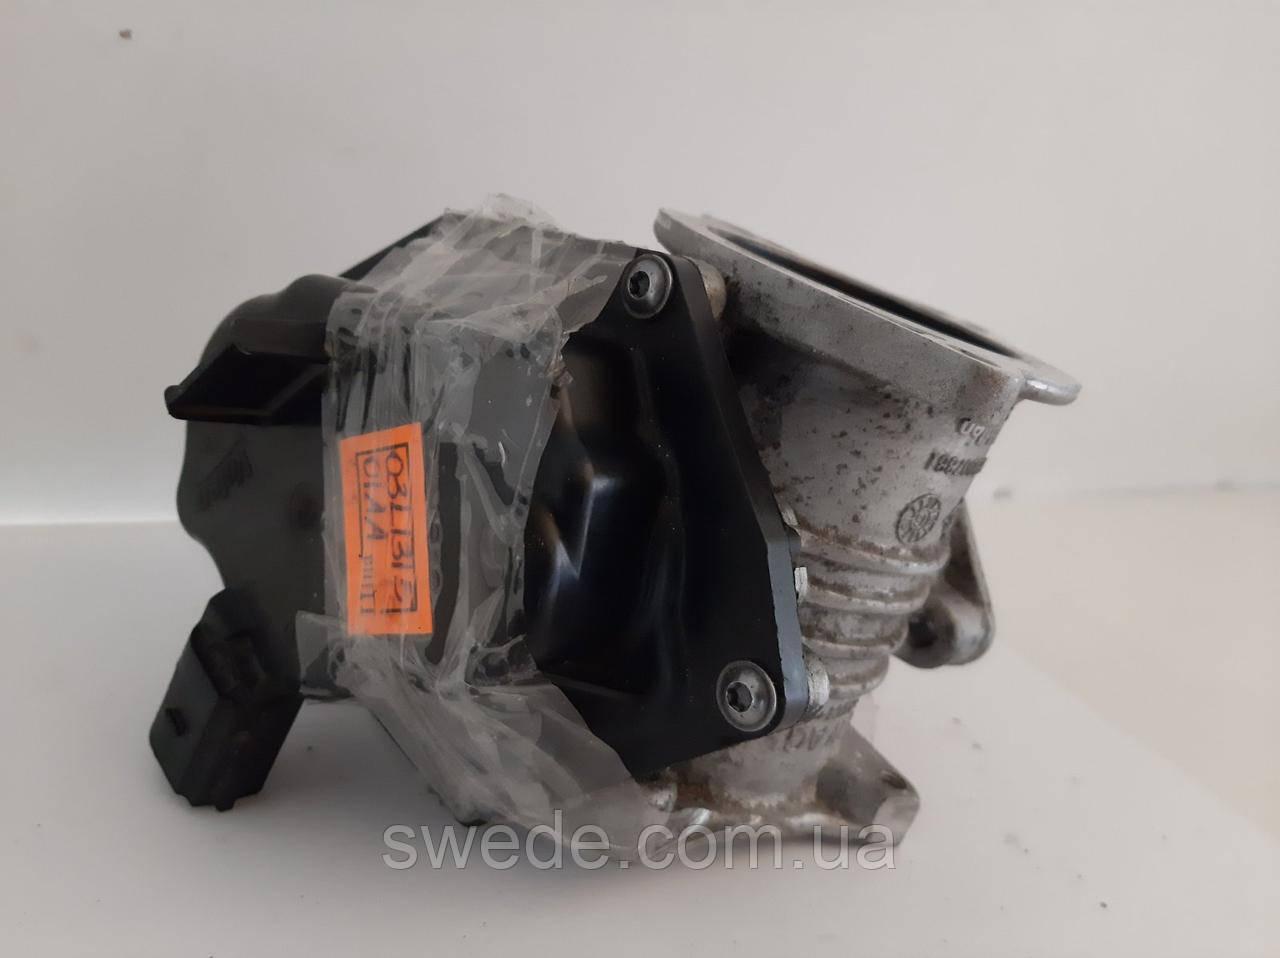 Клапан EGR Volkswagen Amarok Crafter 2.0 TDI 2010-2016 гг 03L131501AA